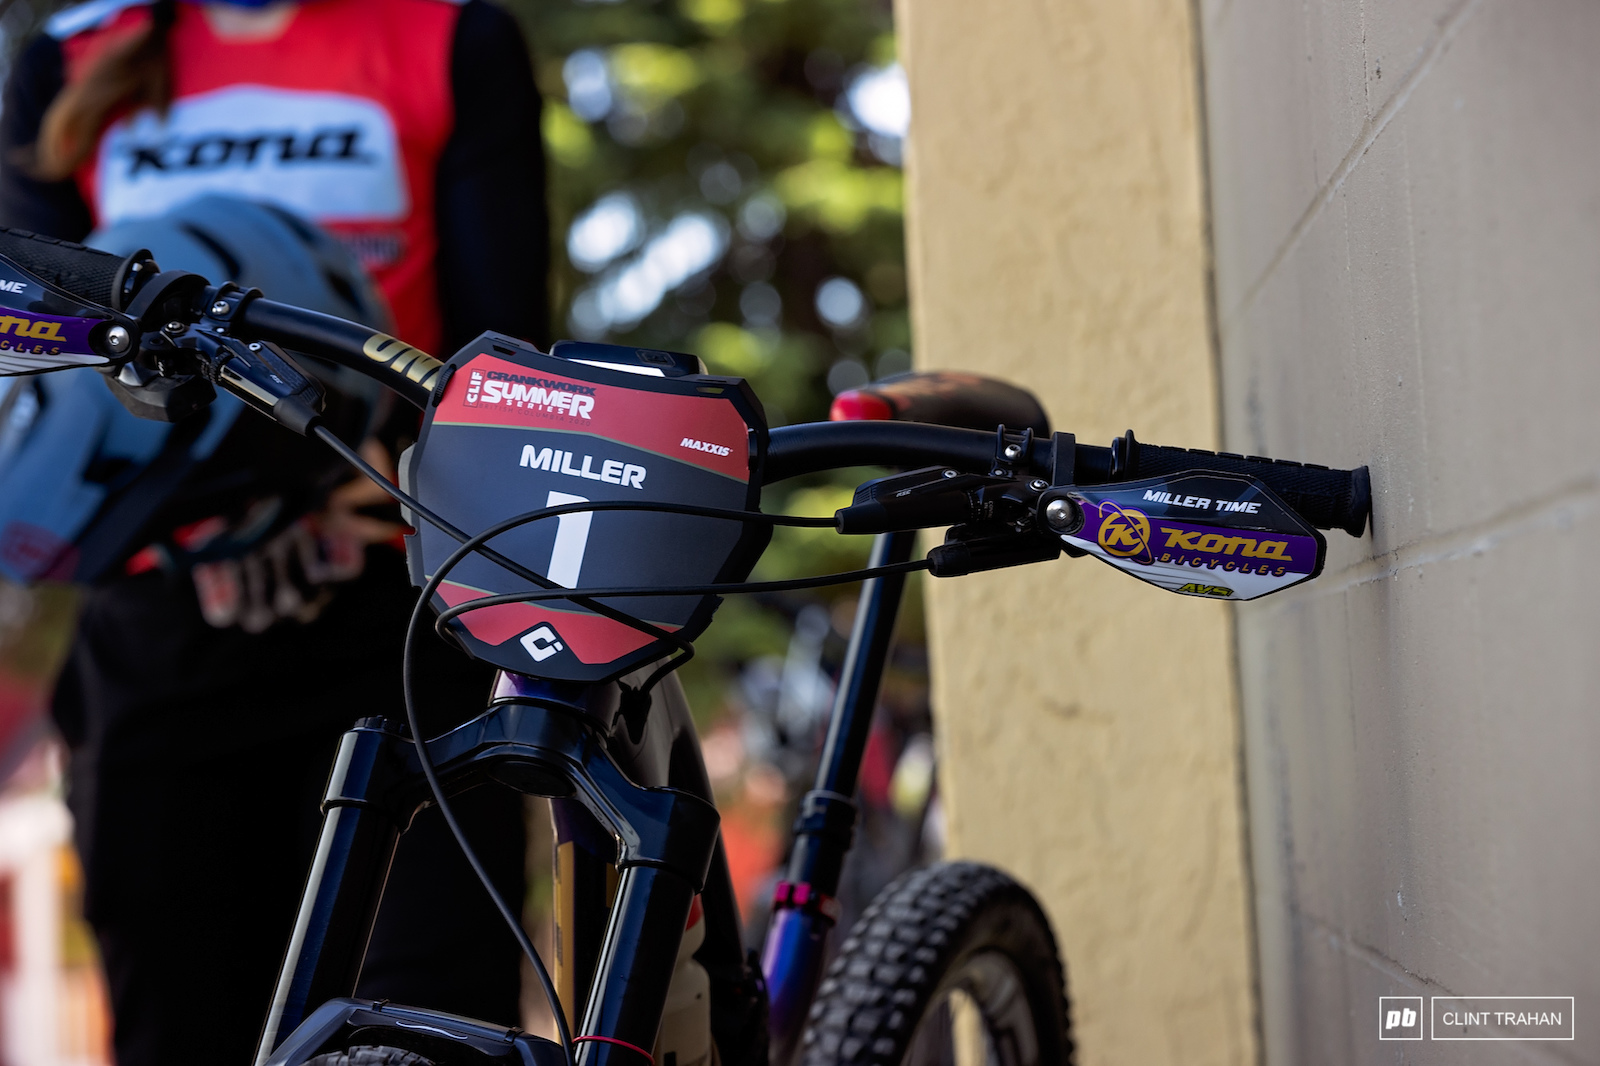 Miranda Miller riding Kona